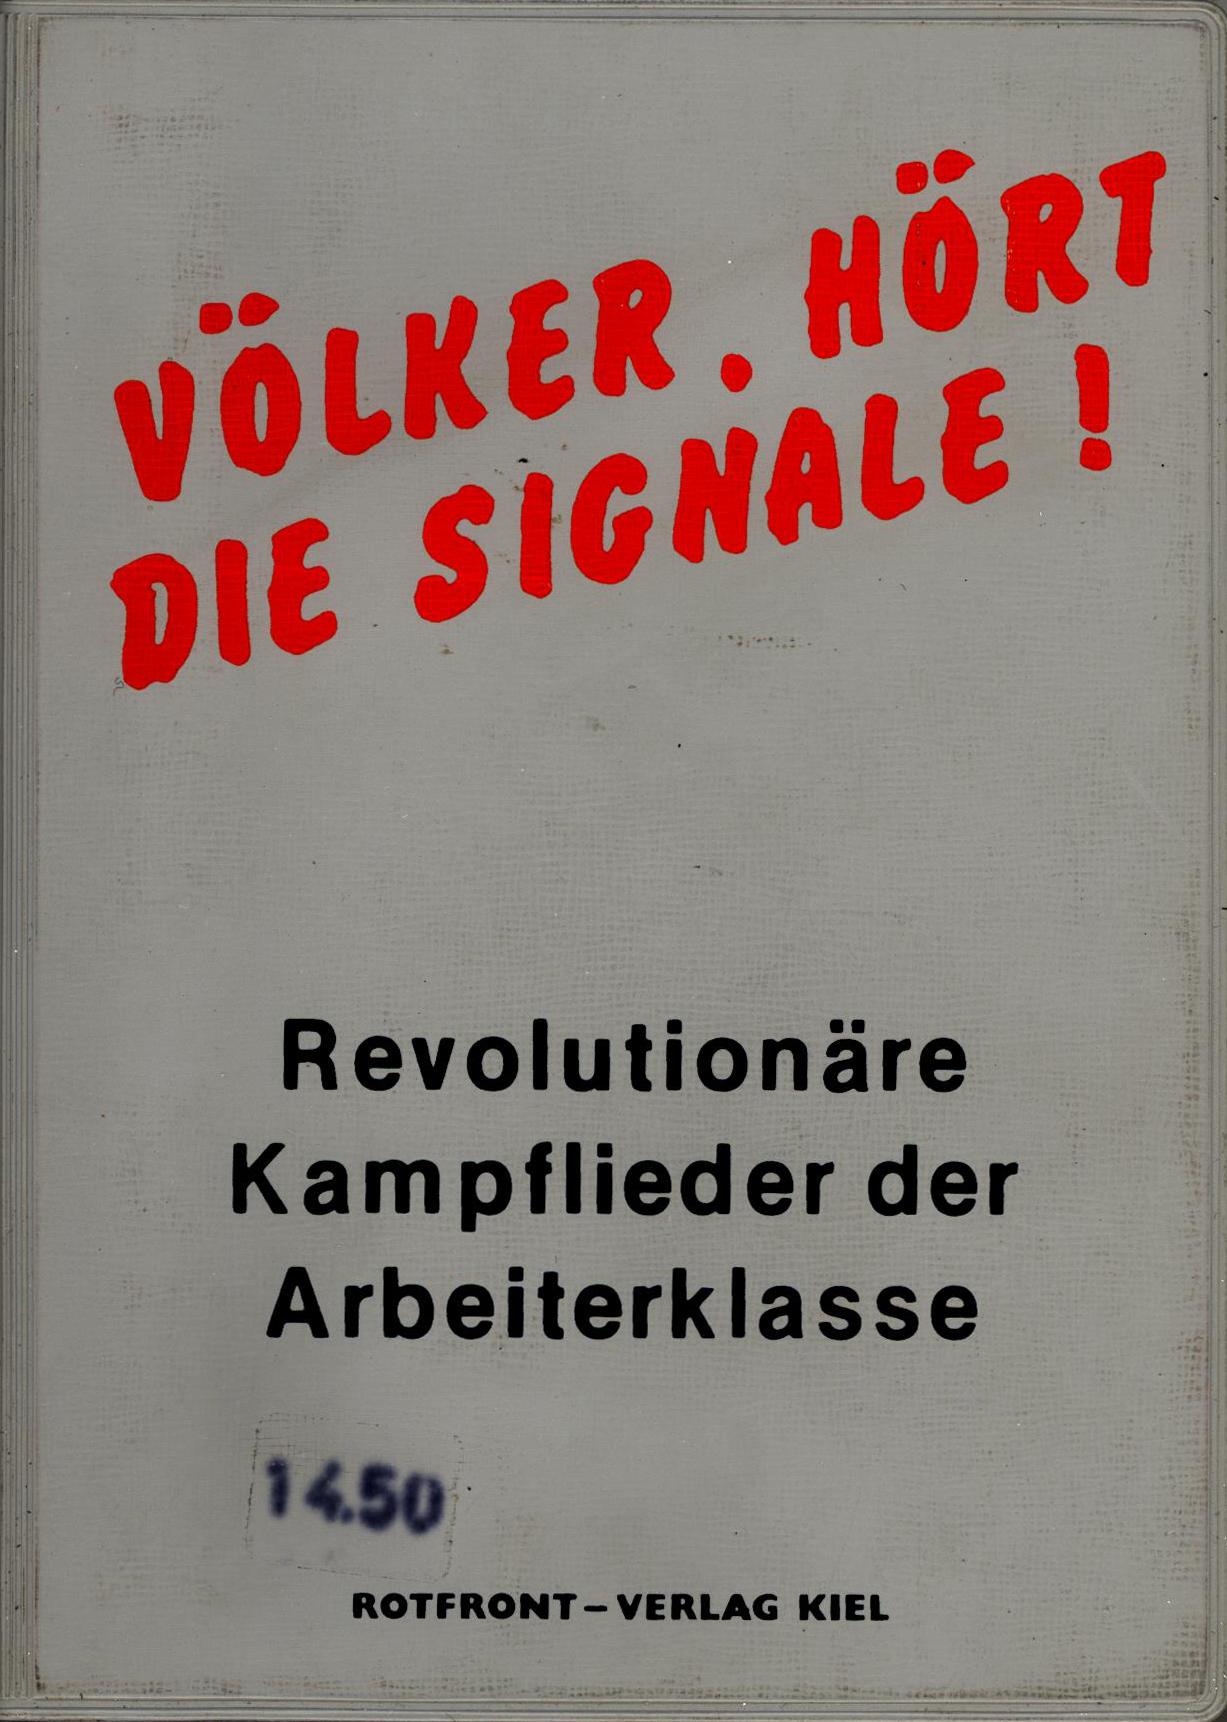 Völker, hört die Signale! Revolutionäre Kampflieder der Arbeiterklasse